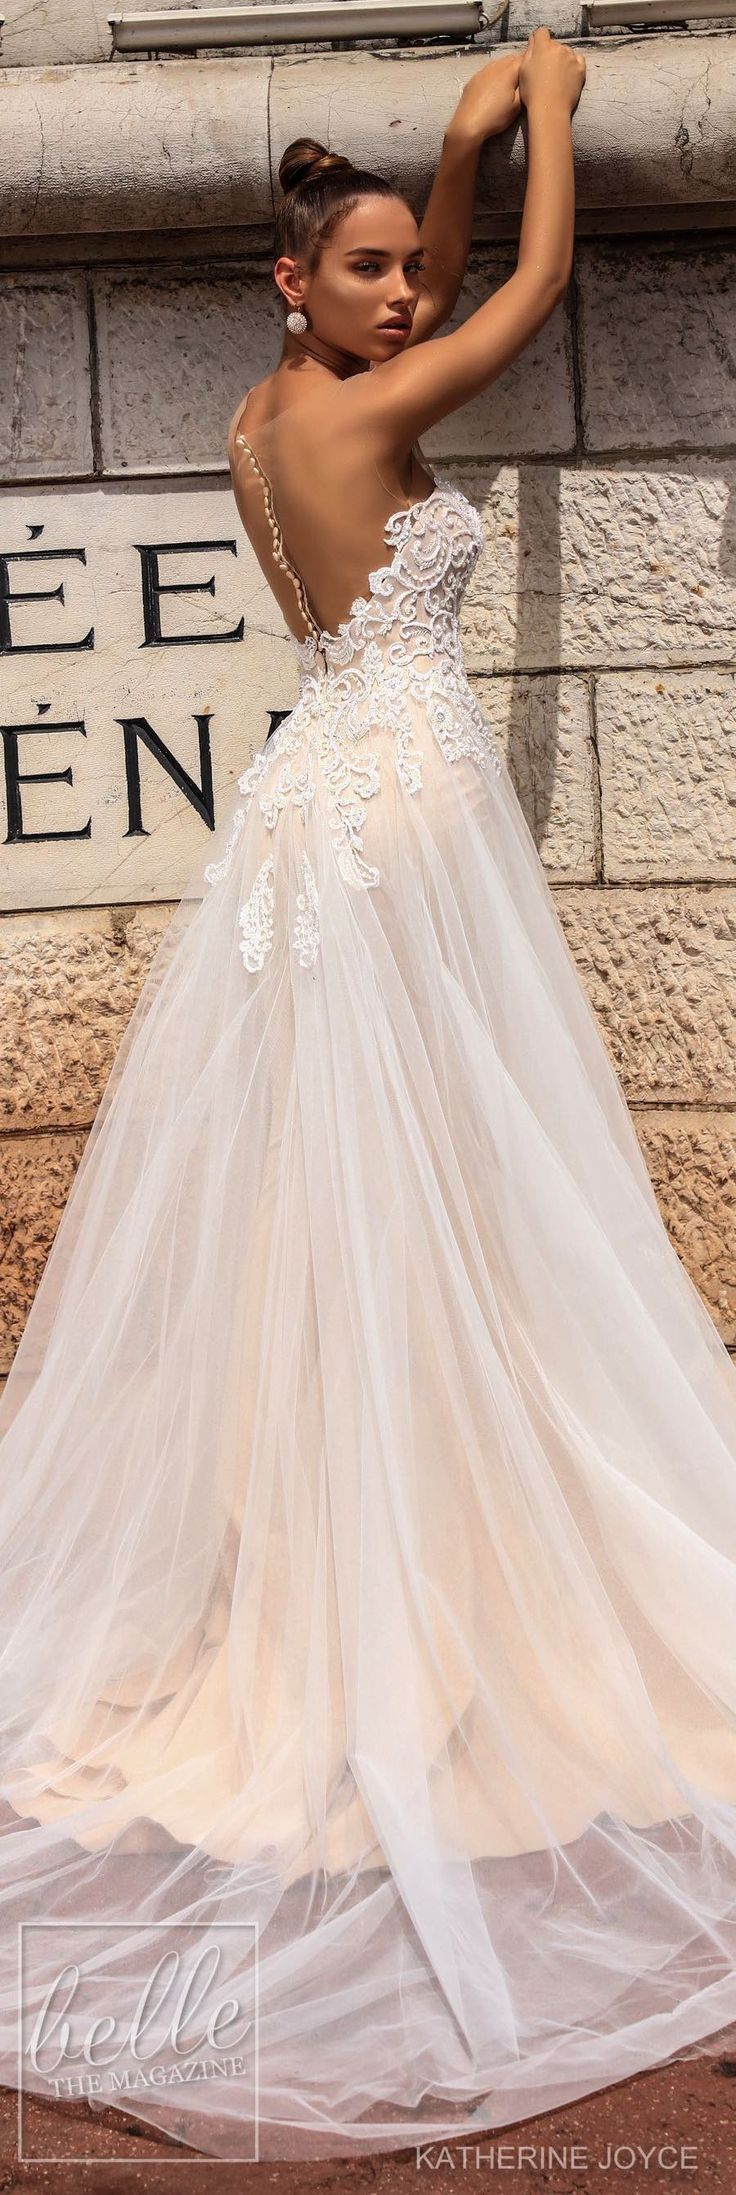 Wedding Dress by Katherine Joyce - Ma Cheri Bridal Collection ...